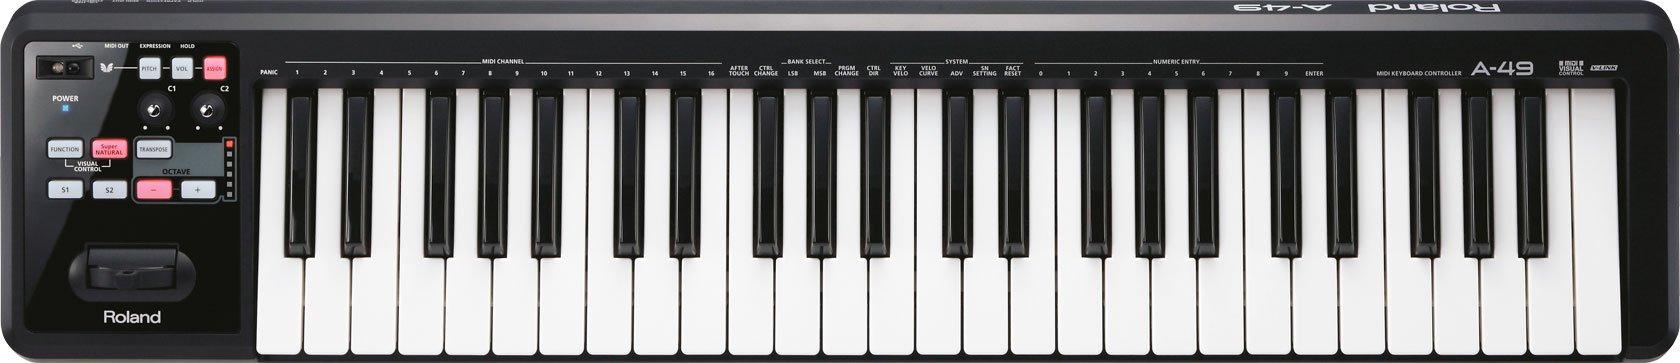 Roland Lightweight 49 Key Keyboard Controller